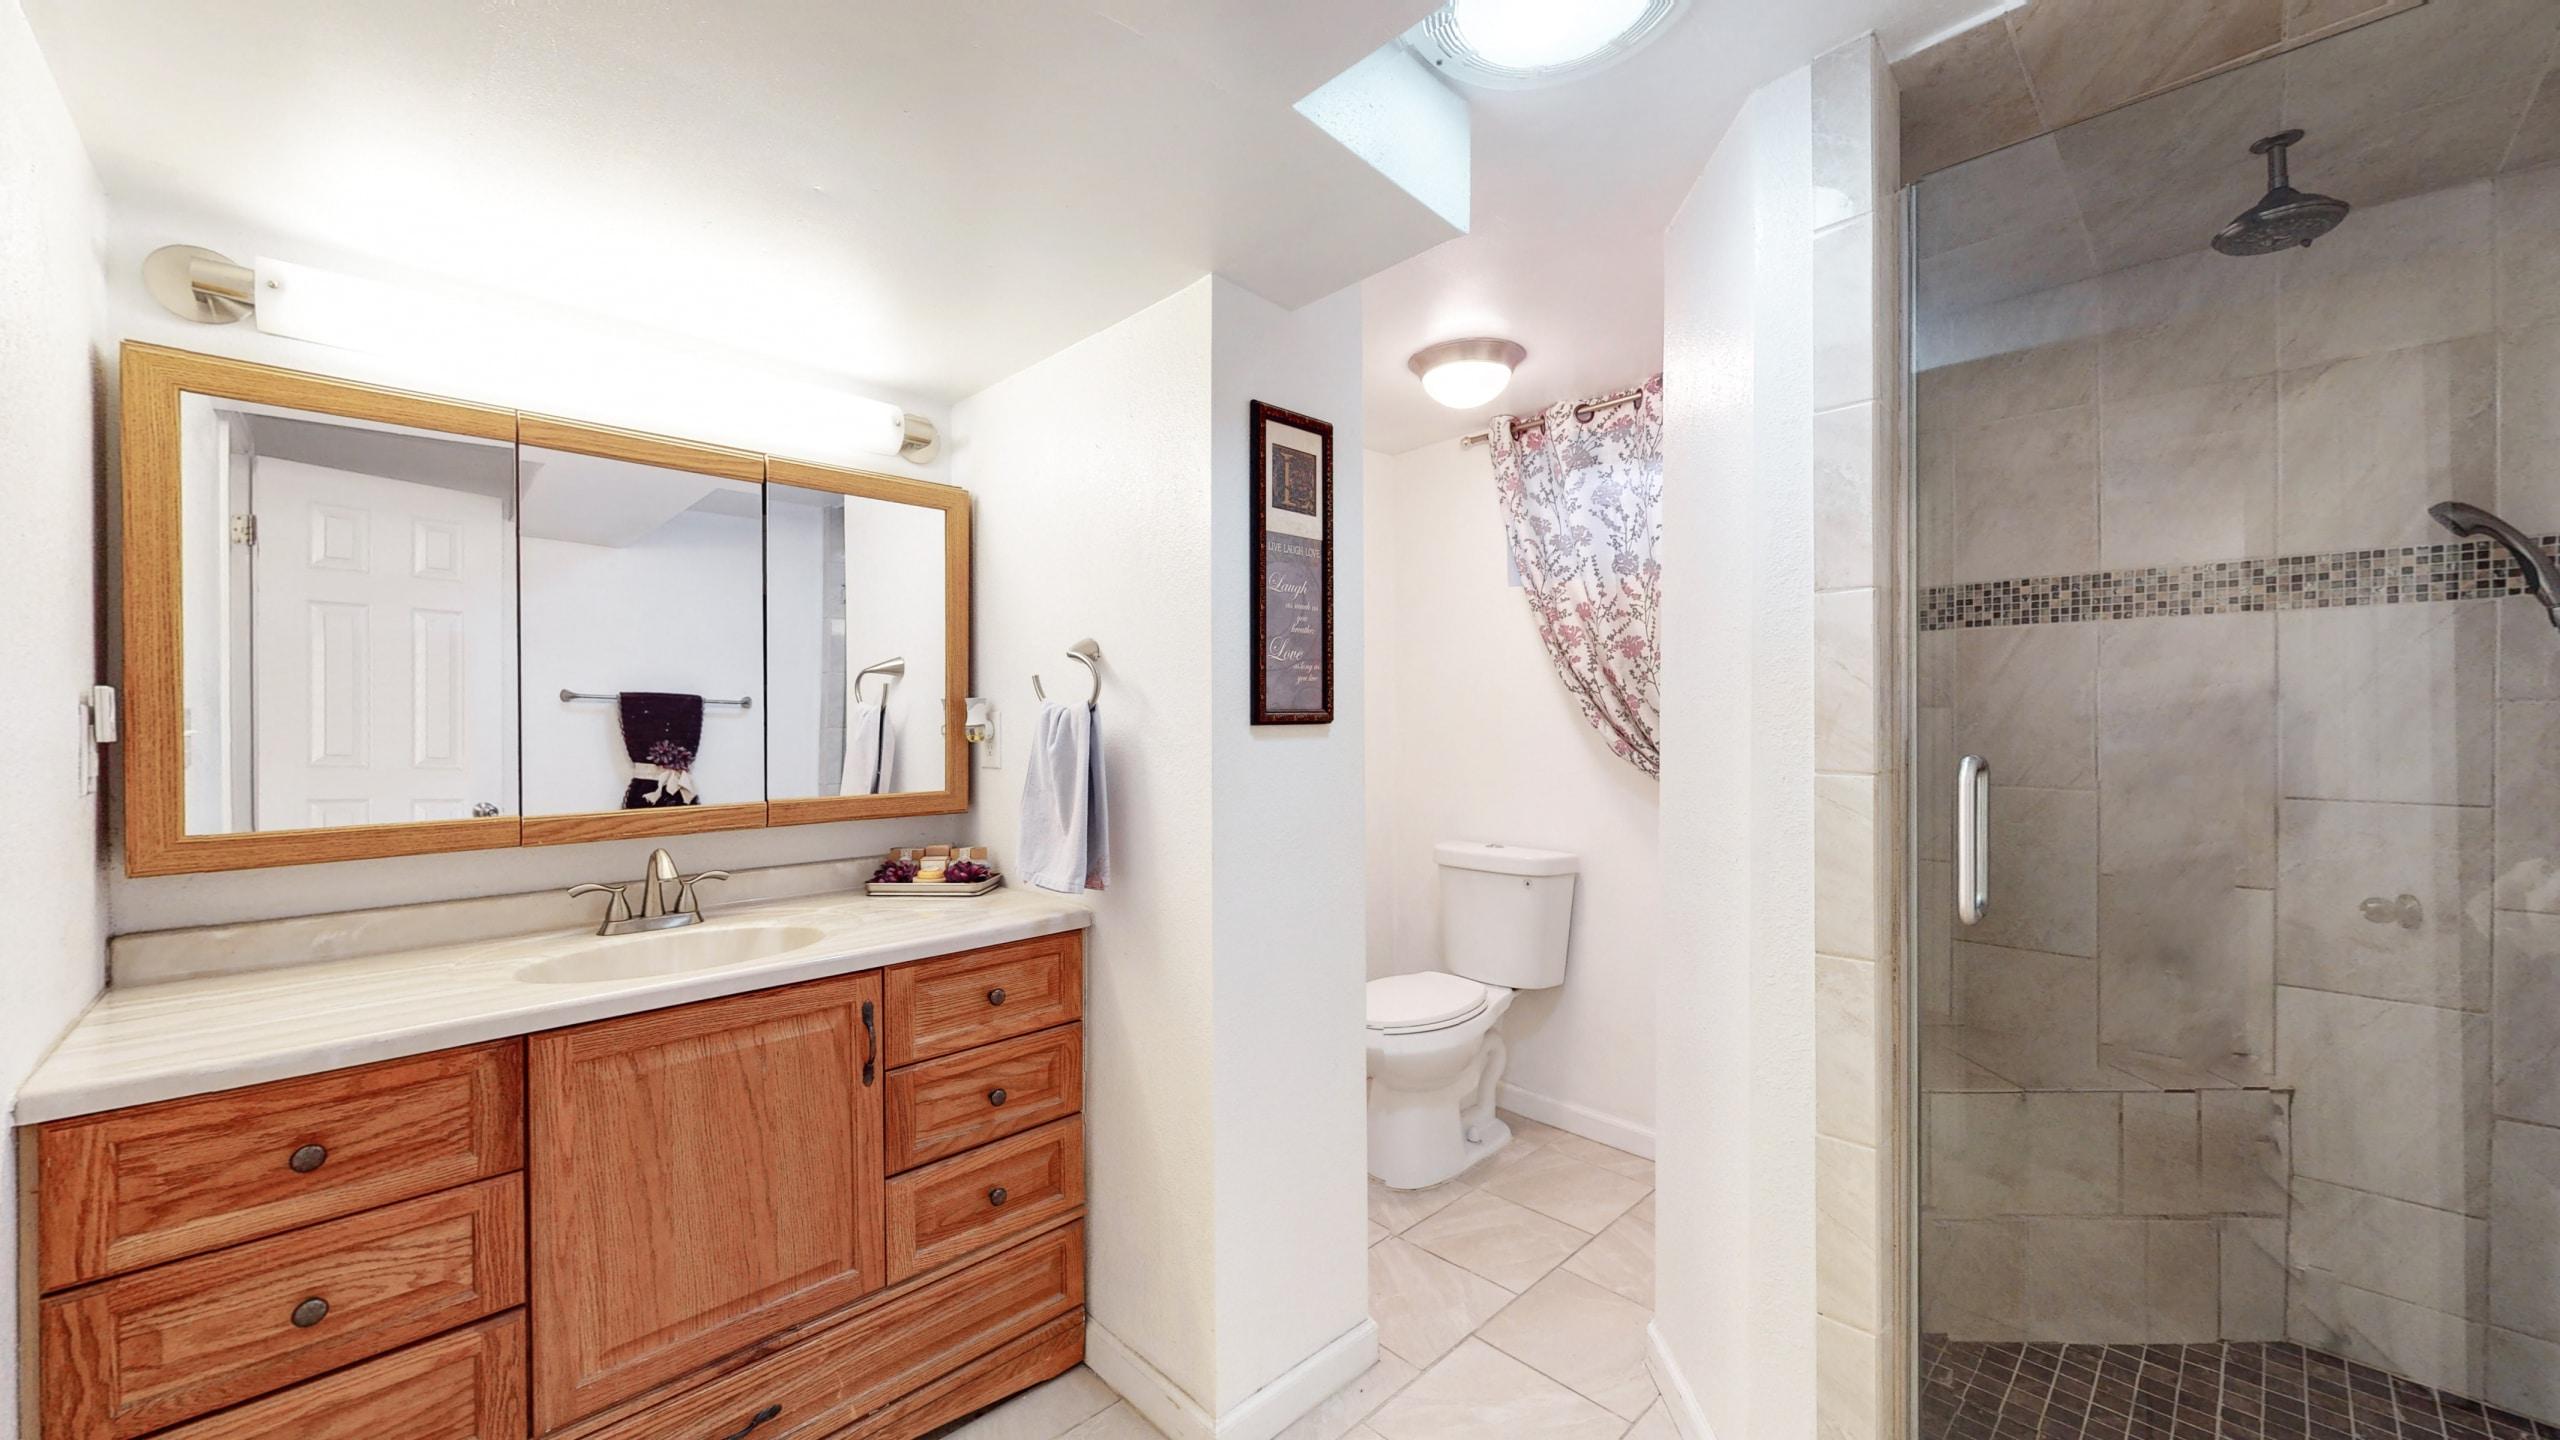 Arvada Home For Sale, Basement Bathroom, Beige tile shower, white tile floor